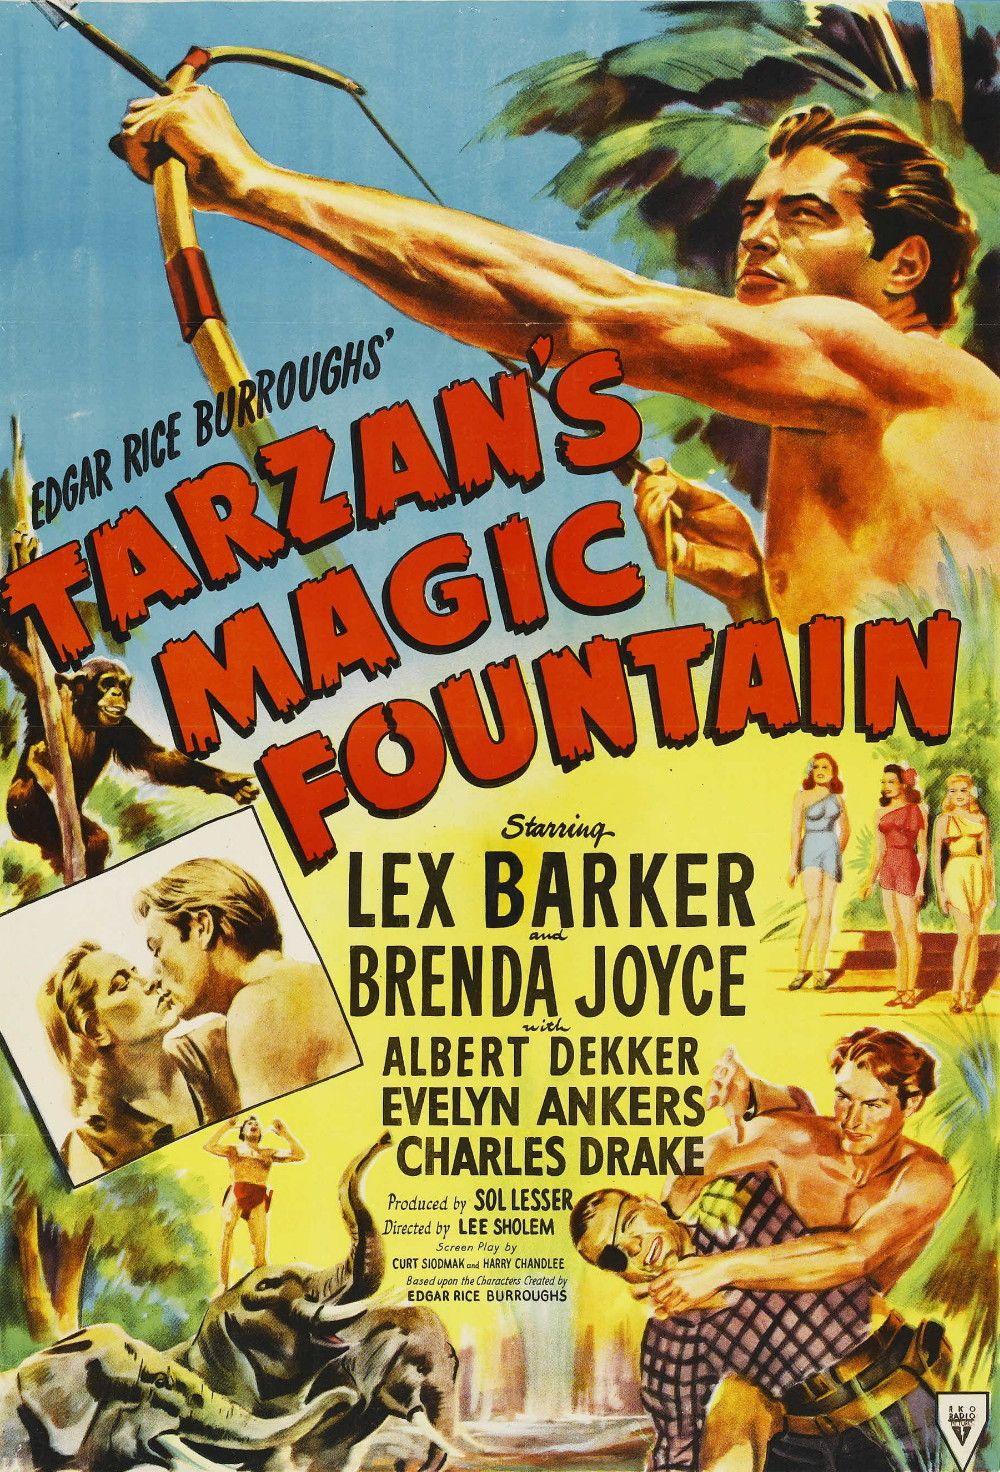 Michael Mays Adventureblog: Tarzan 101 | Tarzans Quest